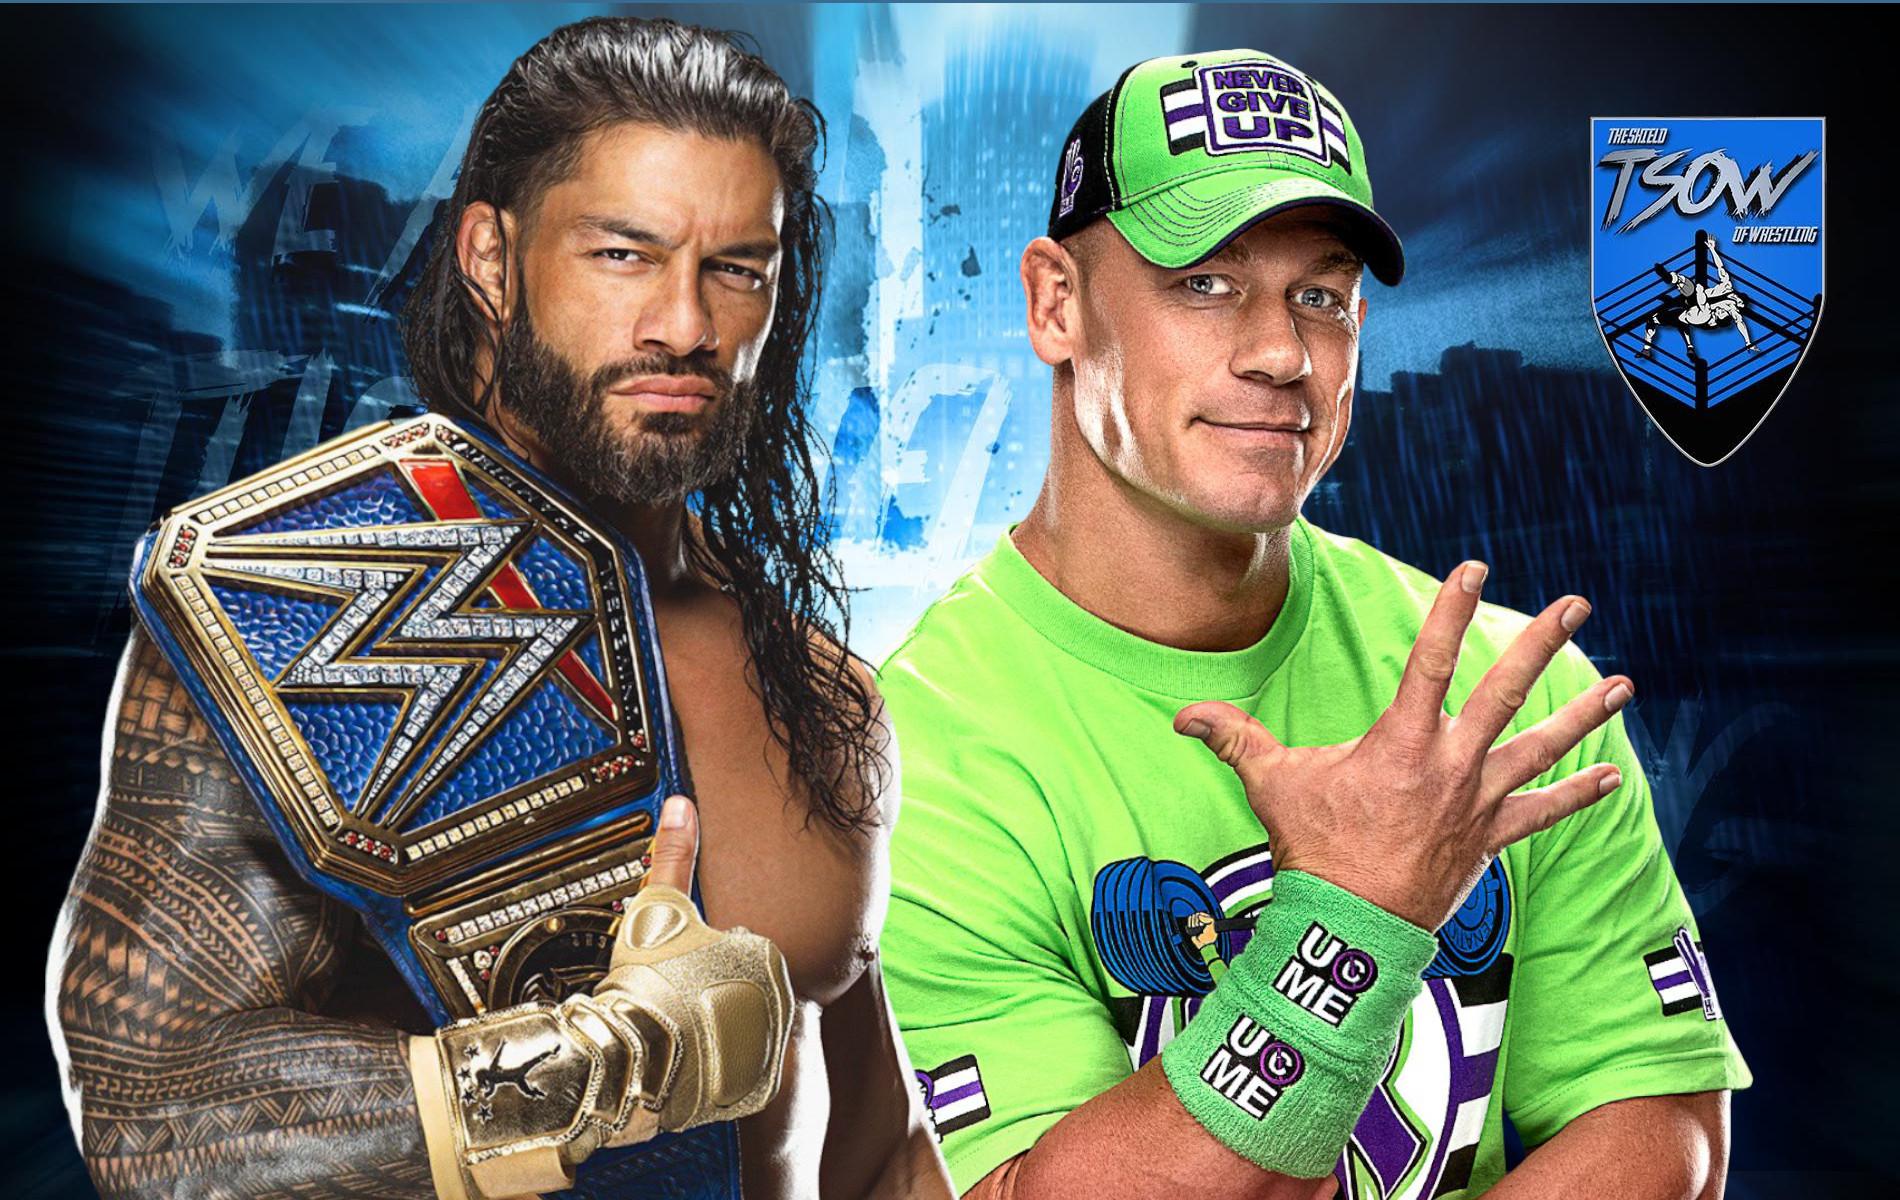 Roman Reigns vs John Cena sarà il main event di SummerSlam?